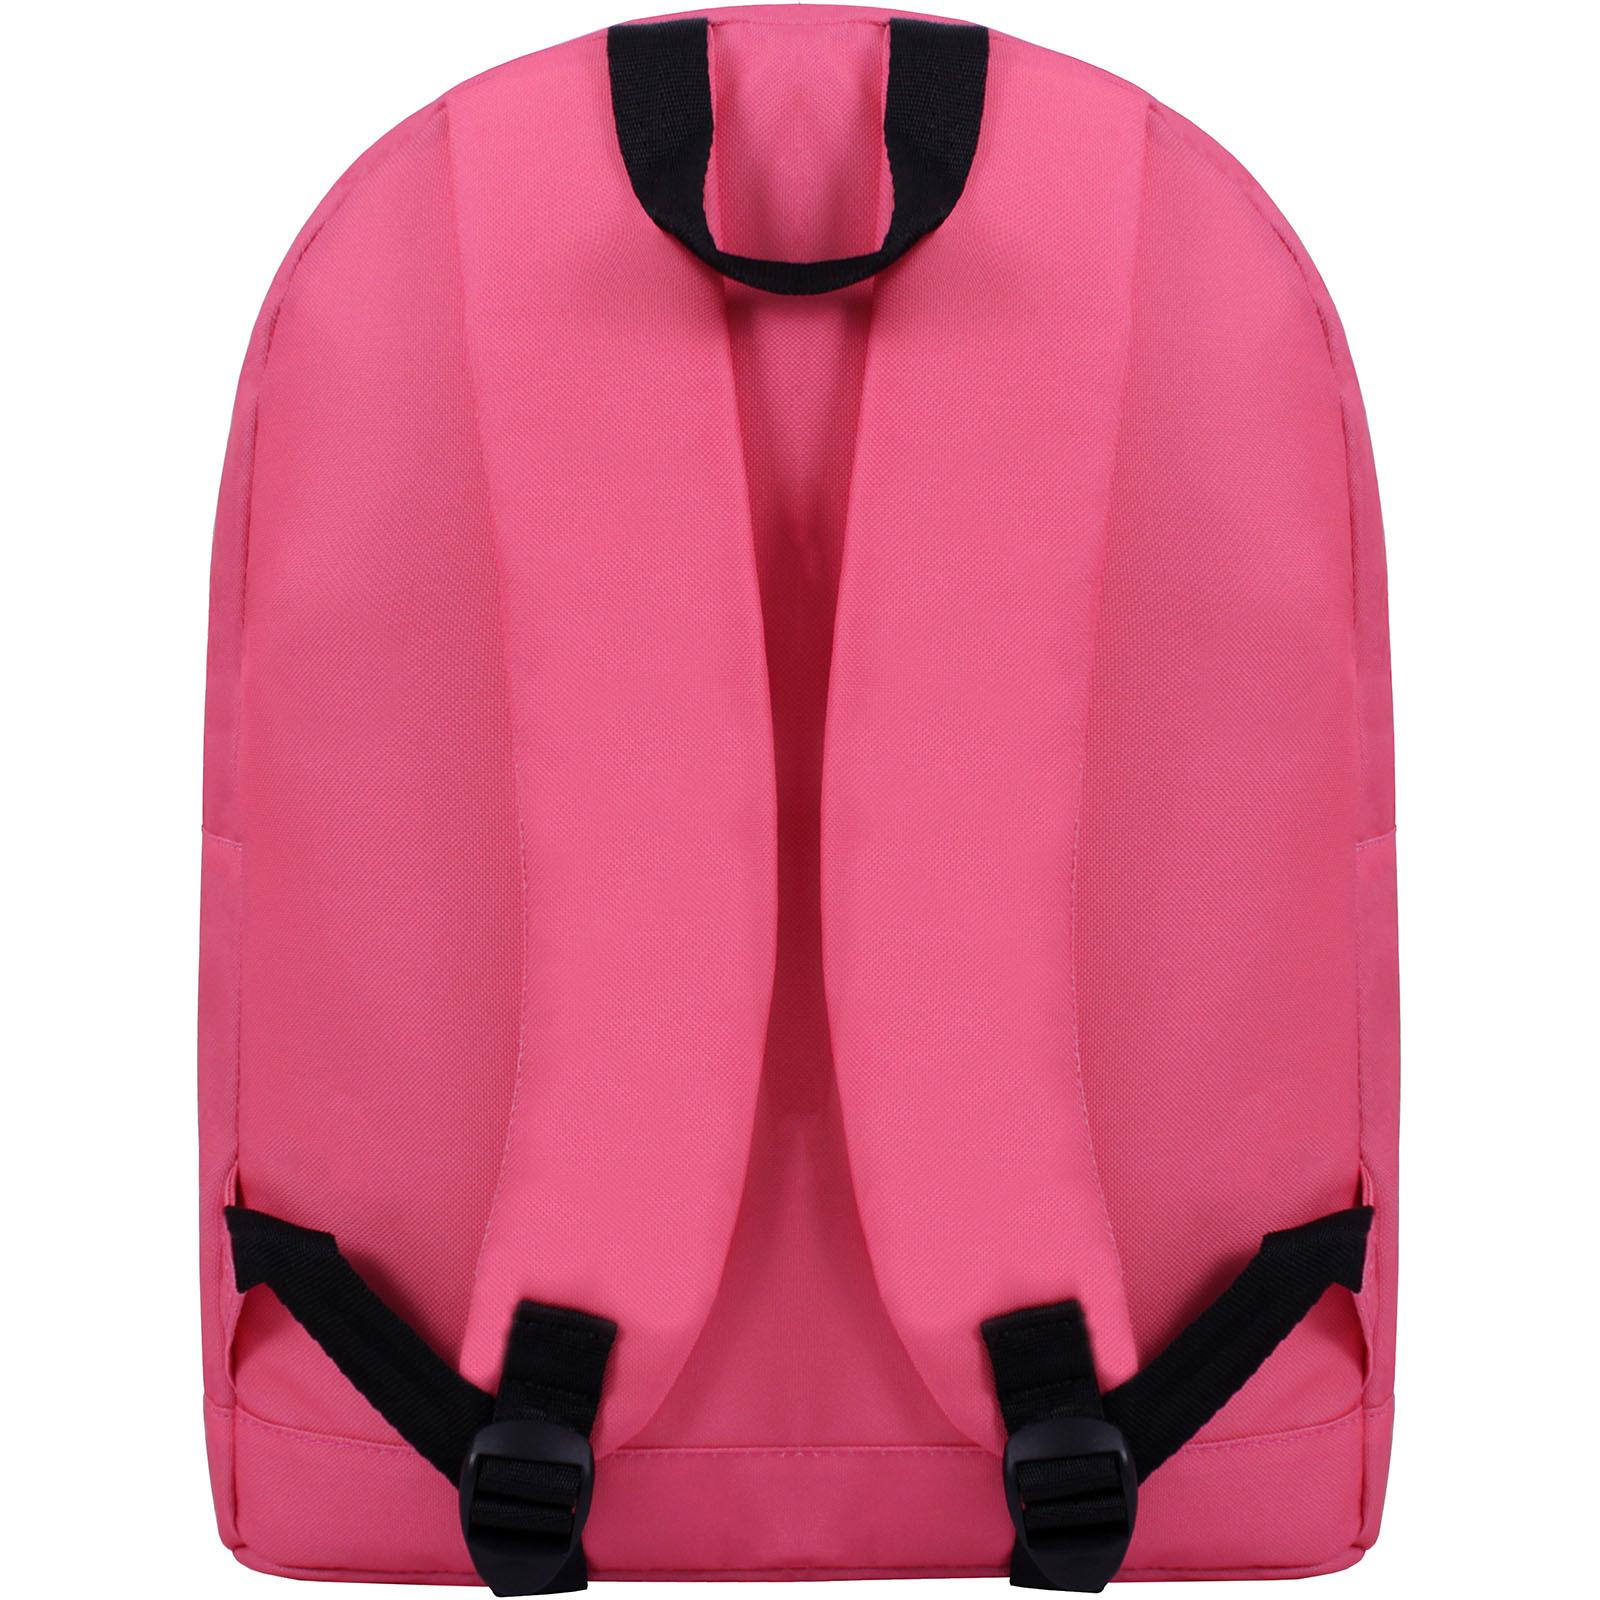 Рюкзак Bagland Молодежный W/R 17 л. Розовый (00533664 Ш) фото 7